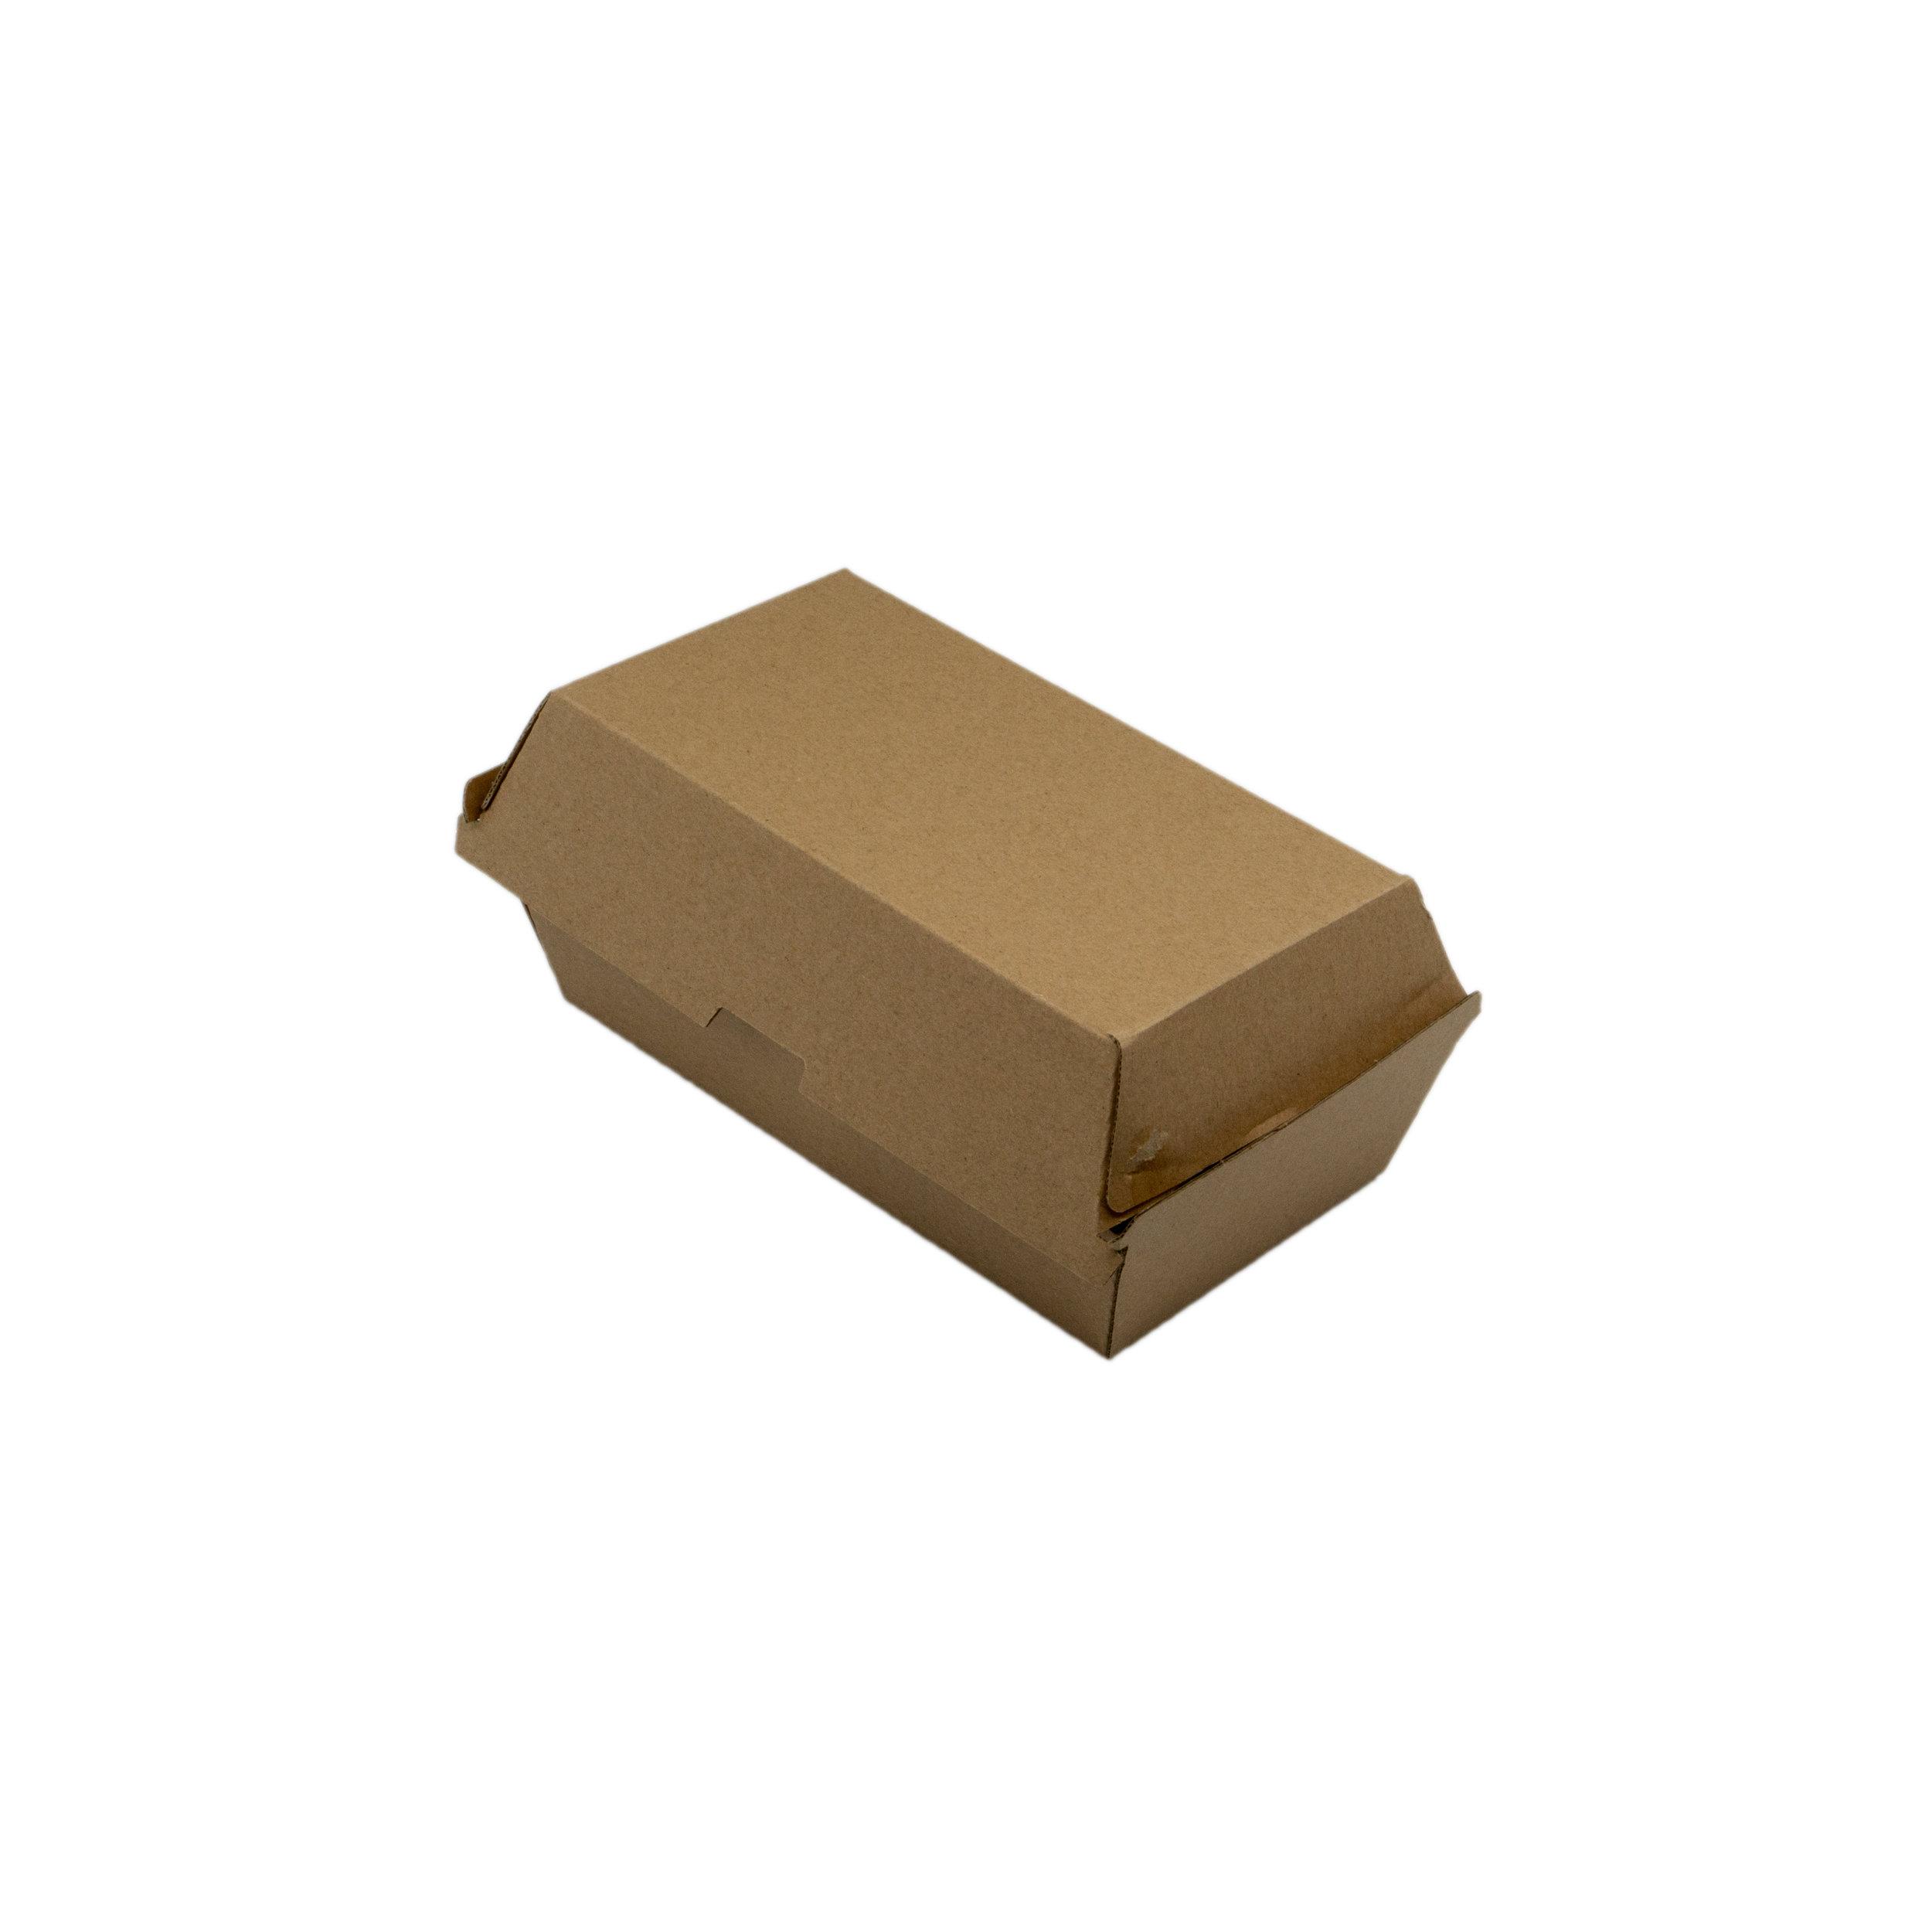 IK-EBSP2 Regular Snack Box   176x91x80mm 4x50 slv 200pcs